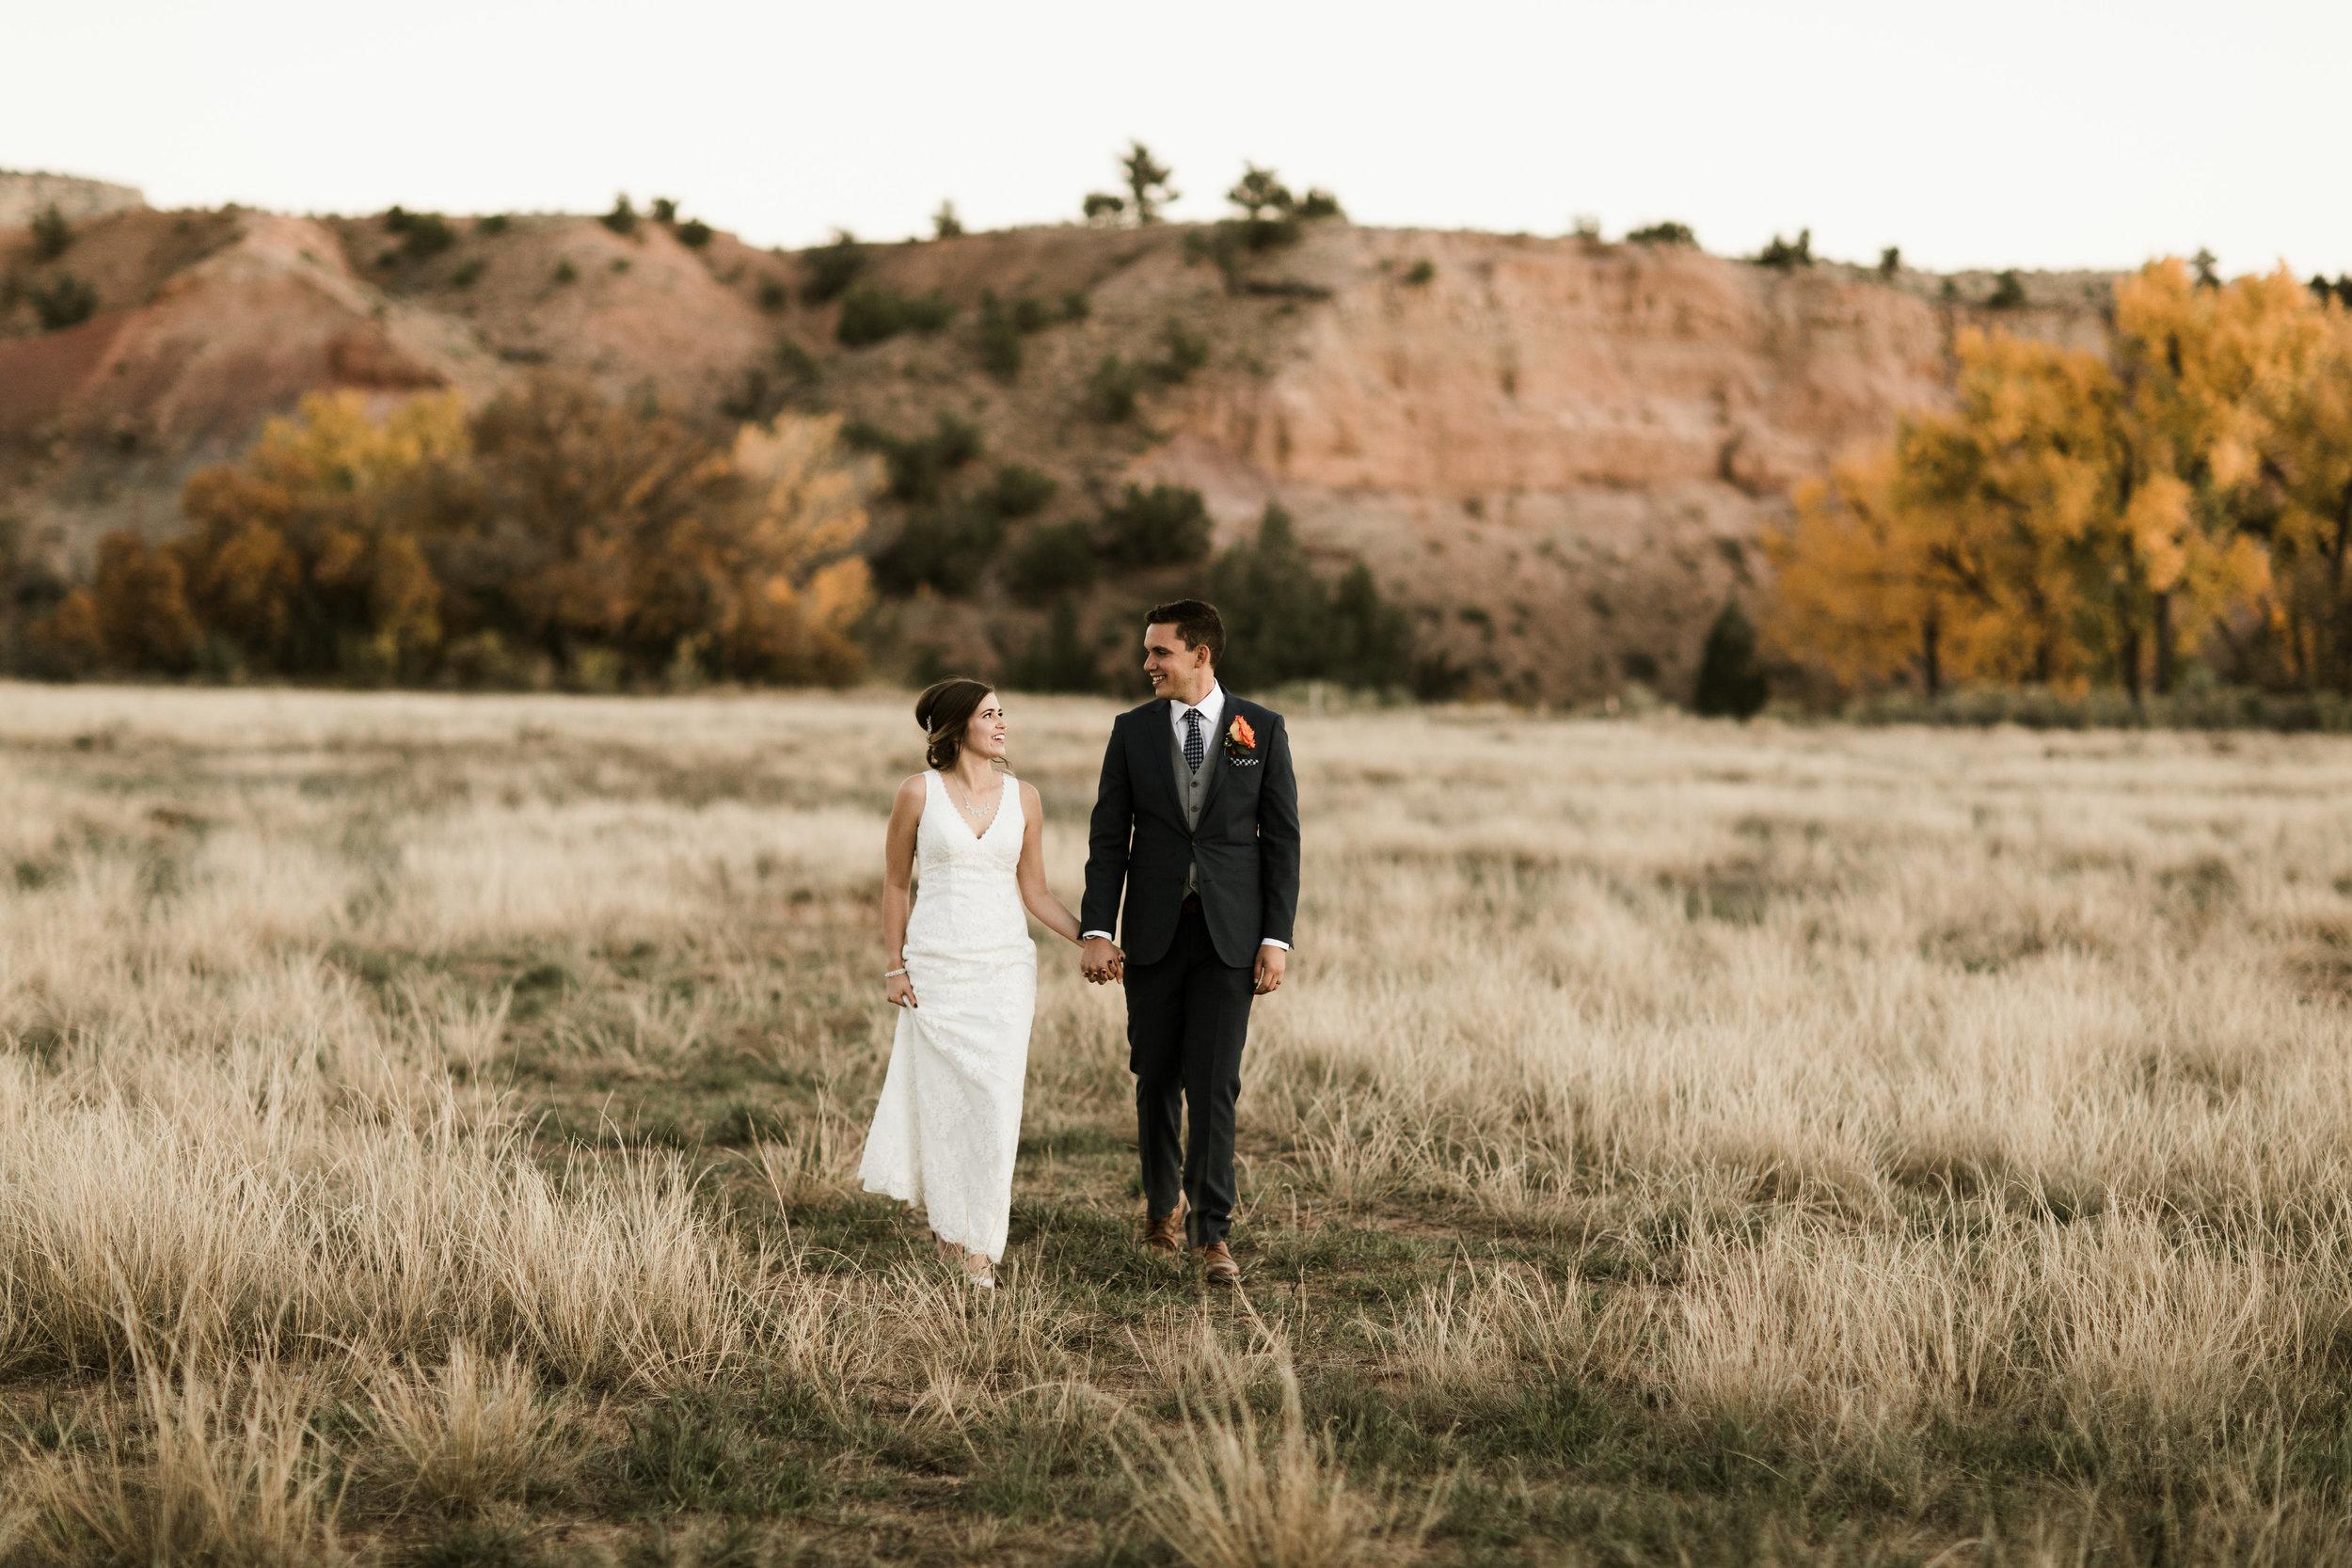 Ryan & Charles | Wedding | Ghost Ranch